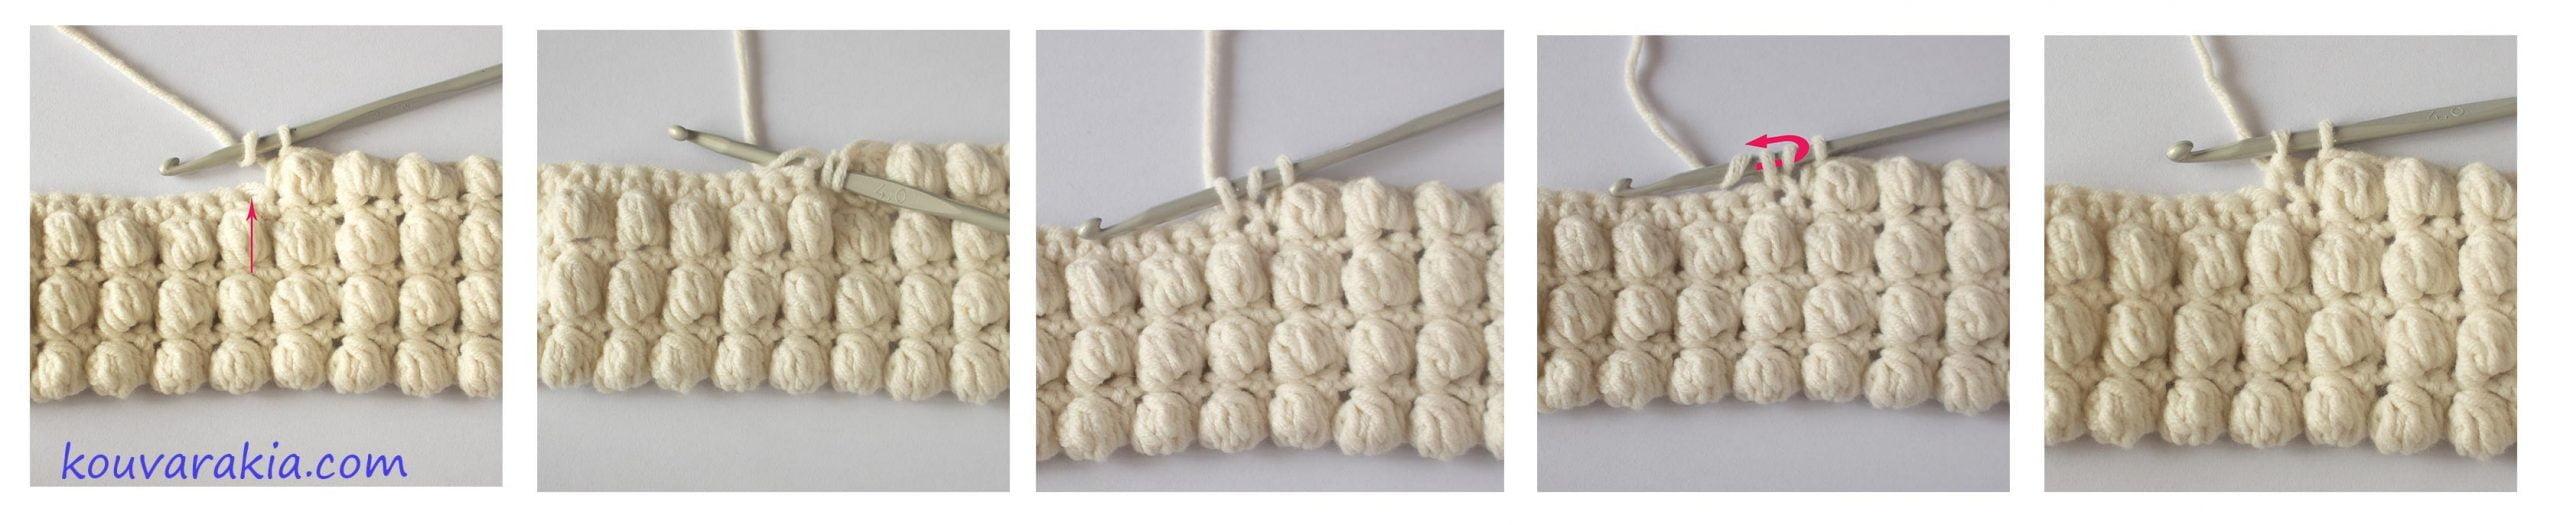 bobble-stitch-step-1